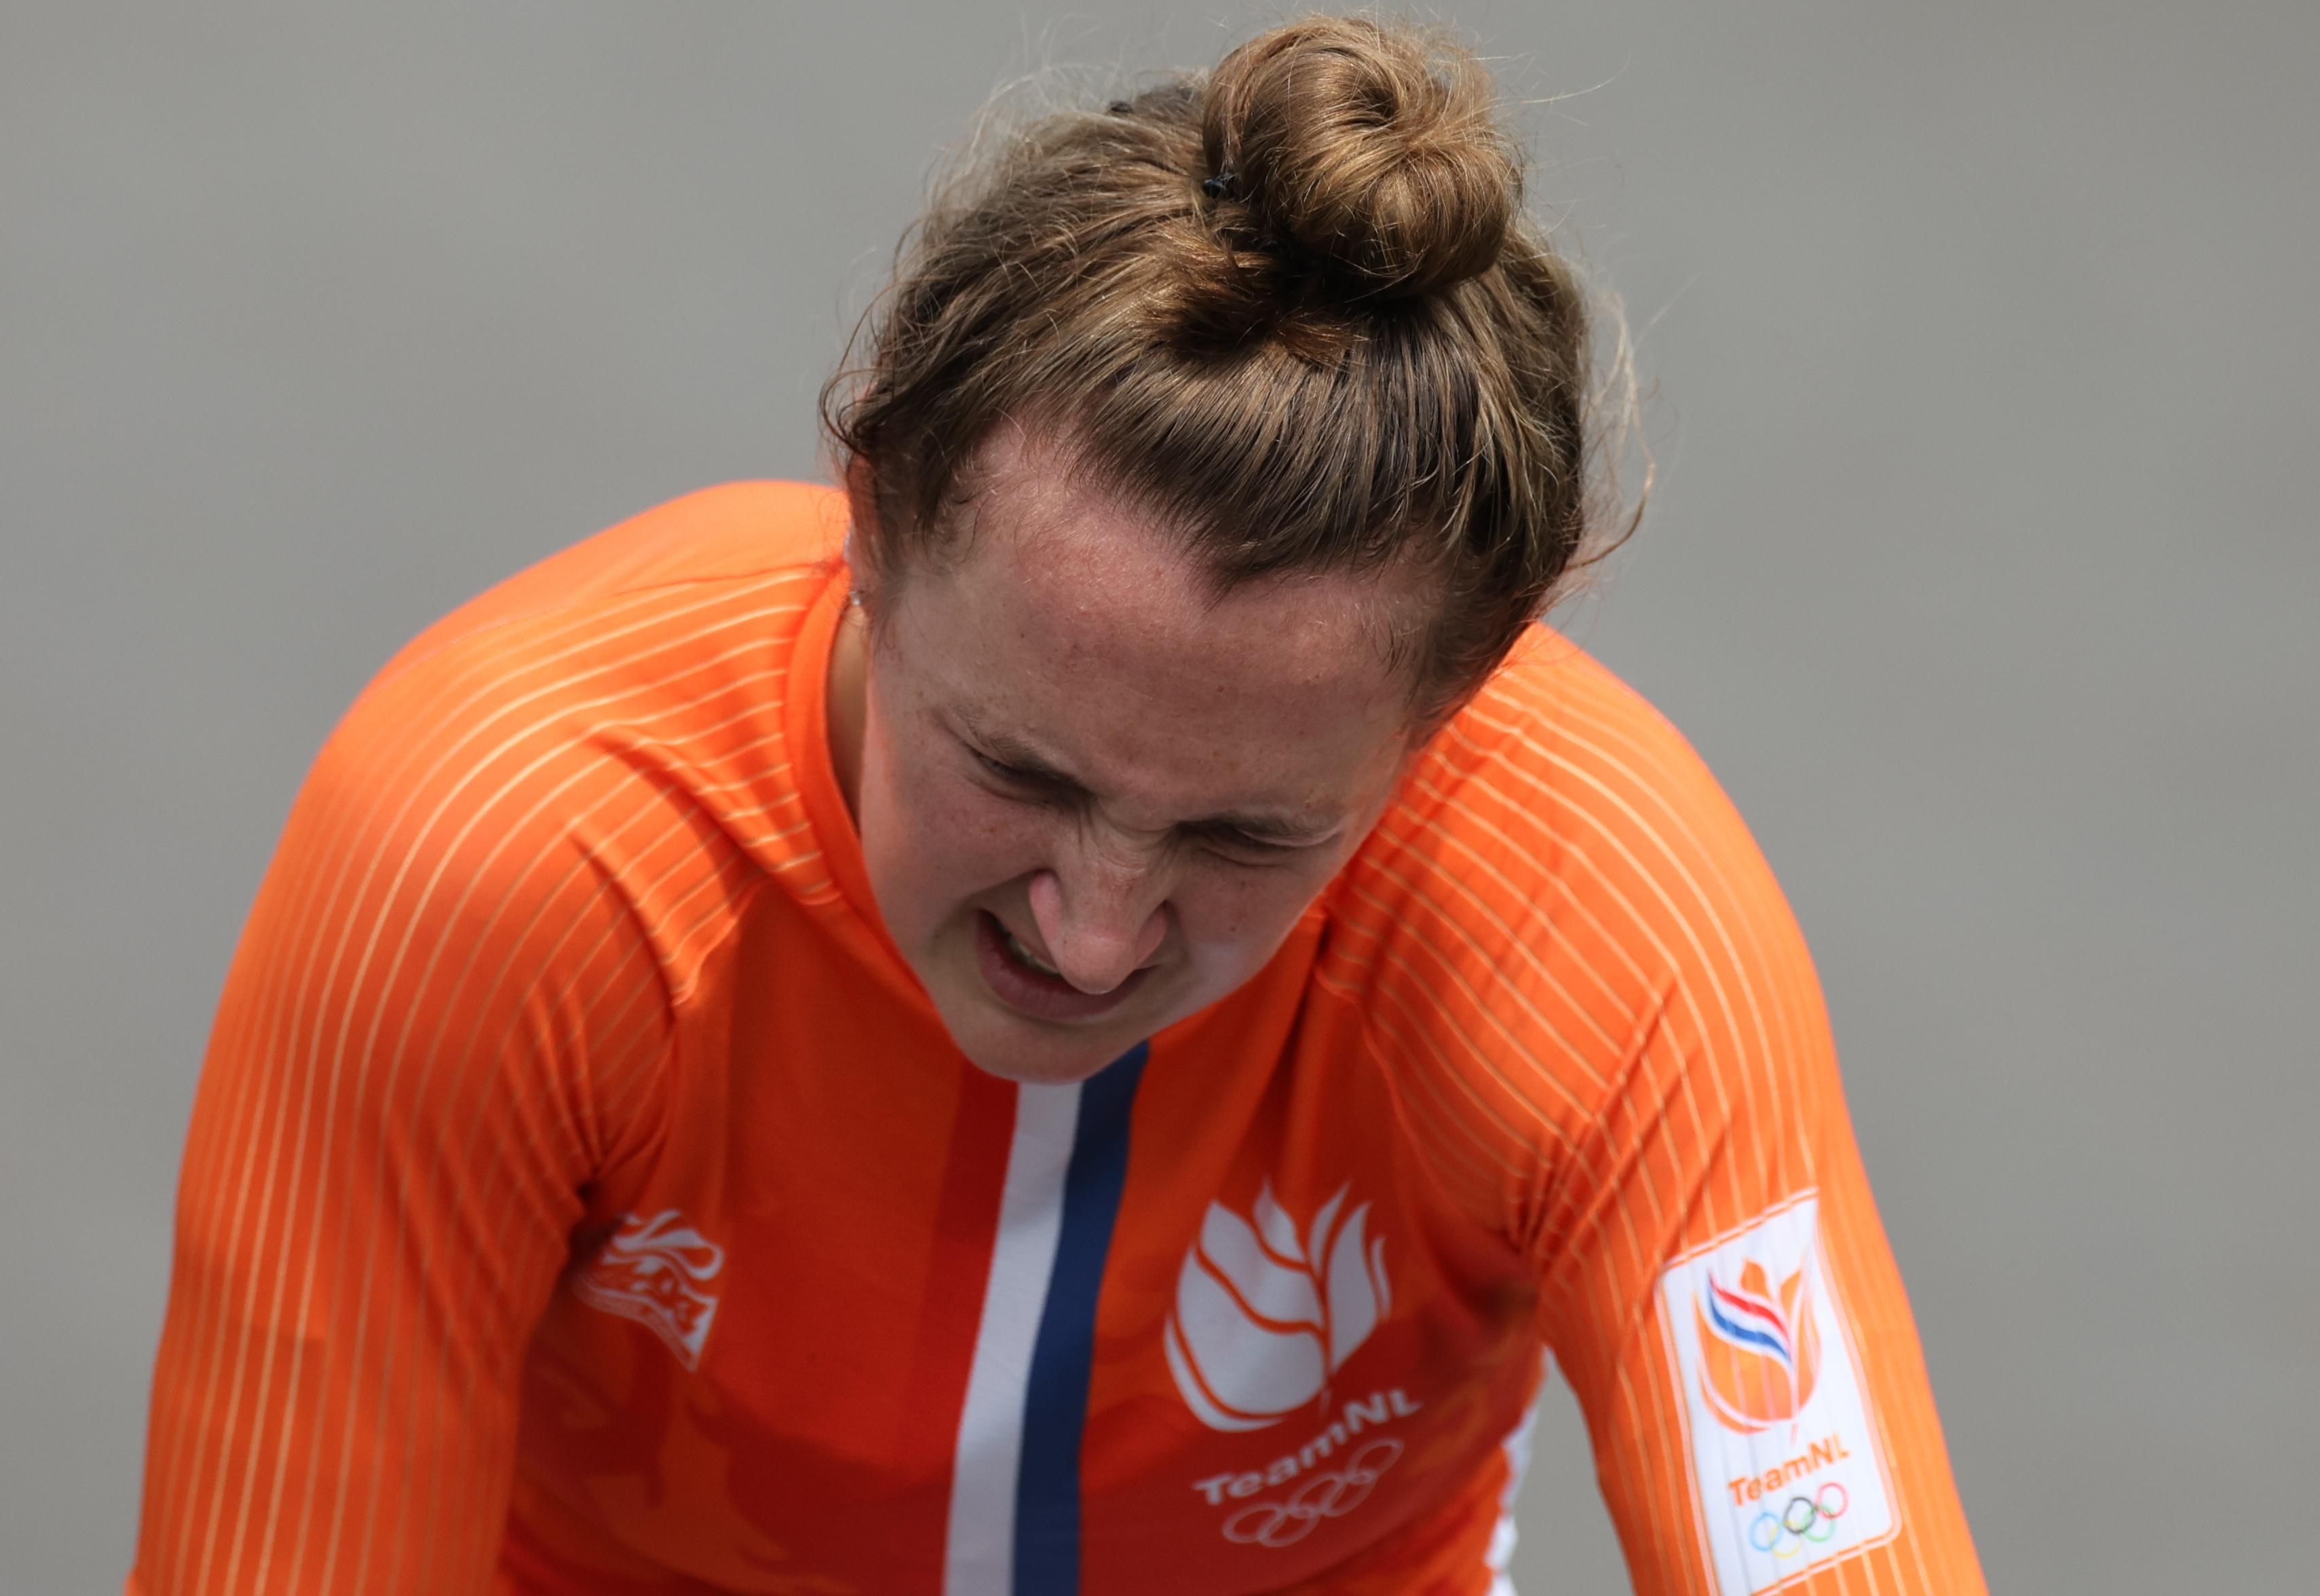 Tokyo 2020 Olympics - BMX Racing - Women's Individual - Semifinal - AUP - Ariake Urban Sports Park, Tokyo, Japan - July 30, 2021. Laura Smulders of the Netherlands reacts after the race. REUTERS/Christian Hartmann - SP1EH7U09PZLI